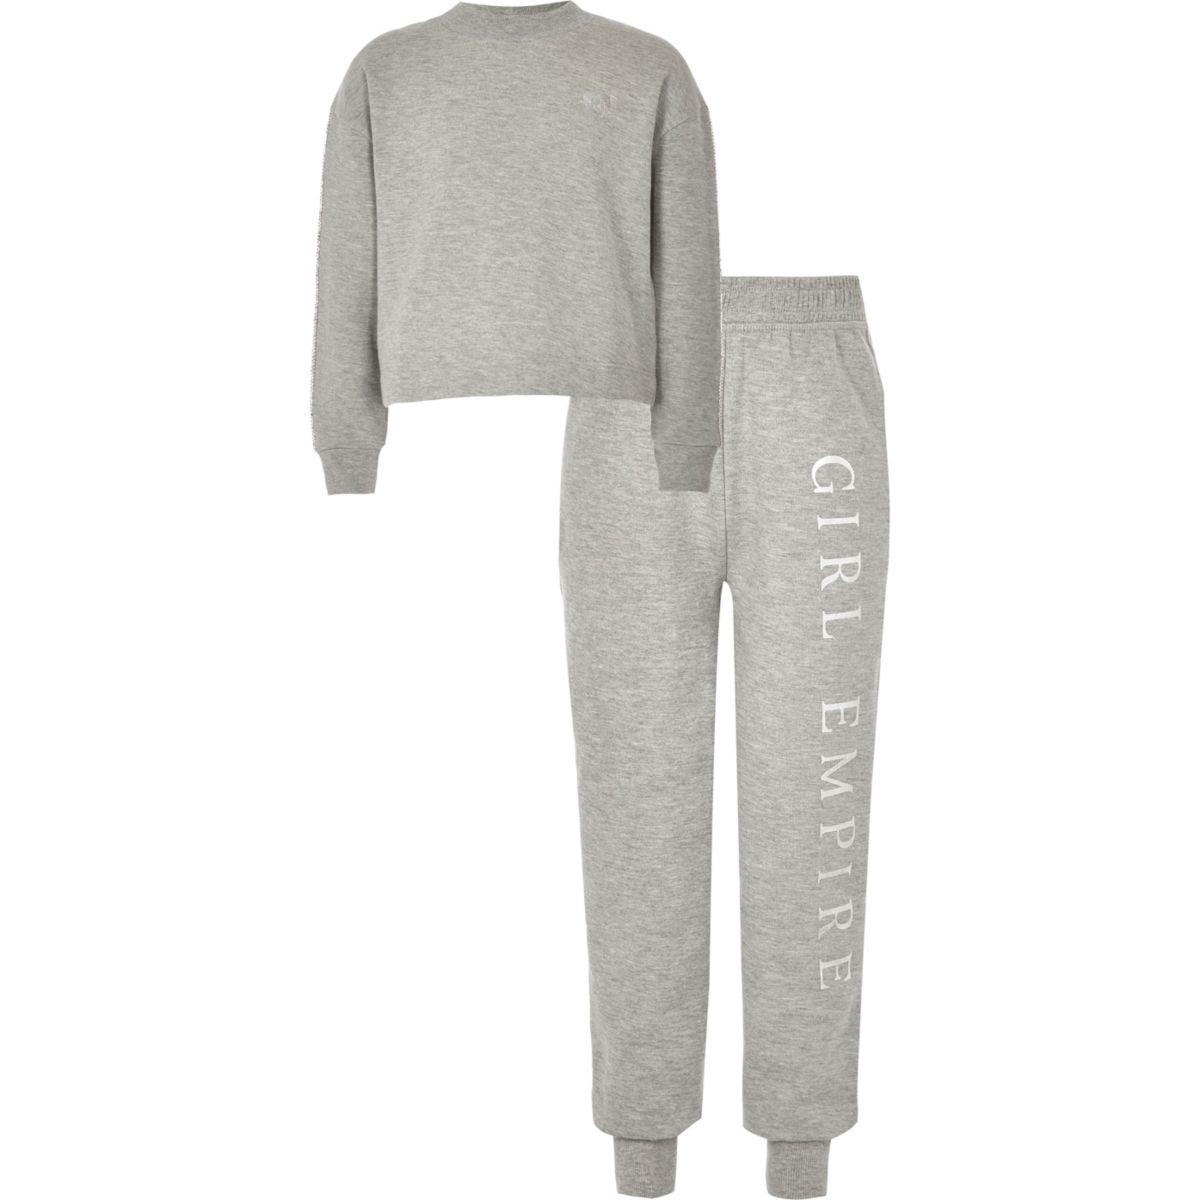 Girls grey rhinestone trim sweat outfit